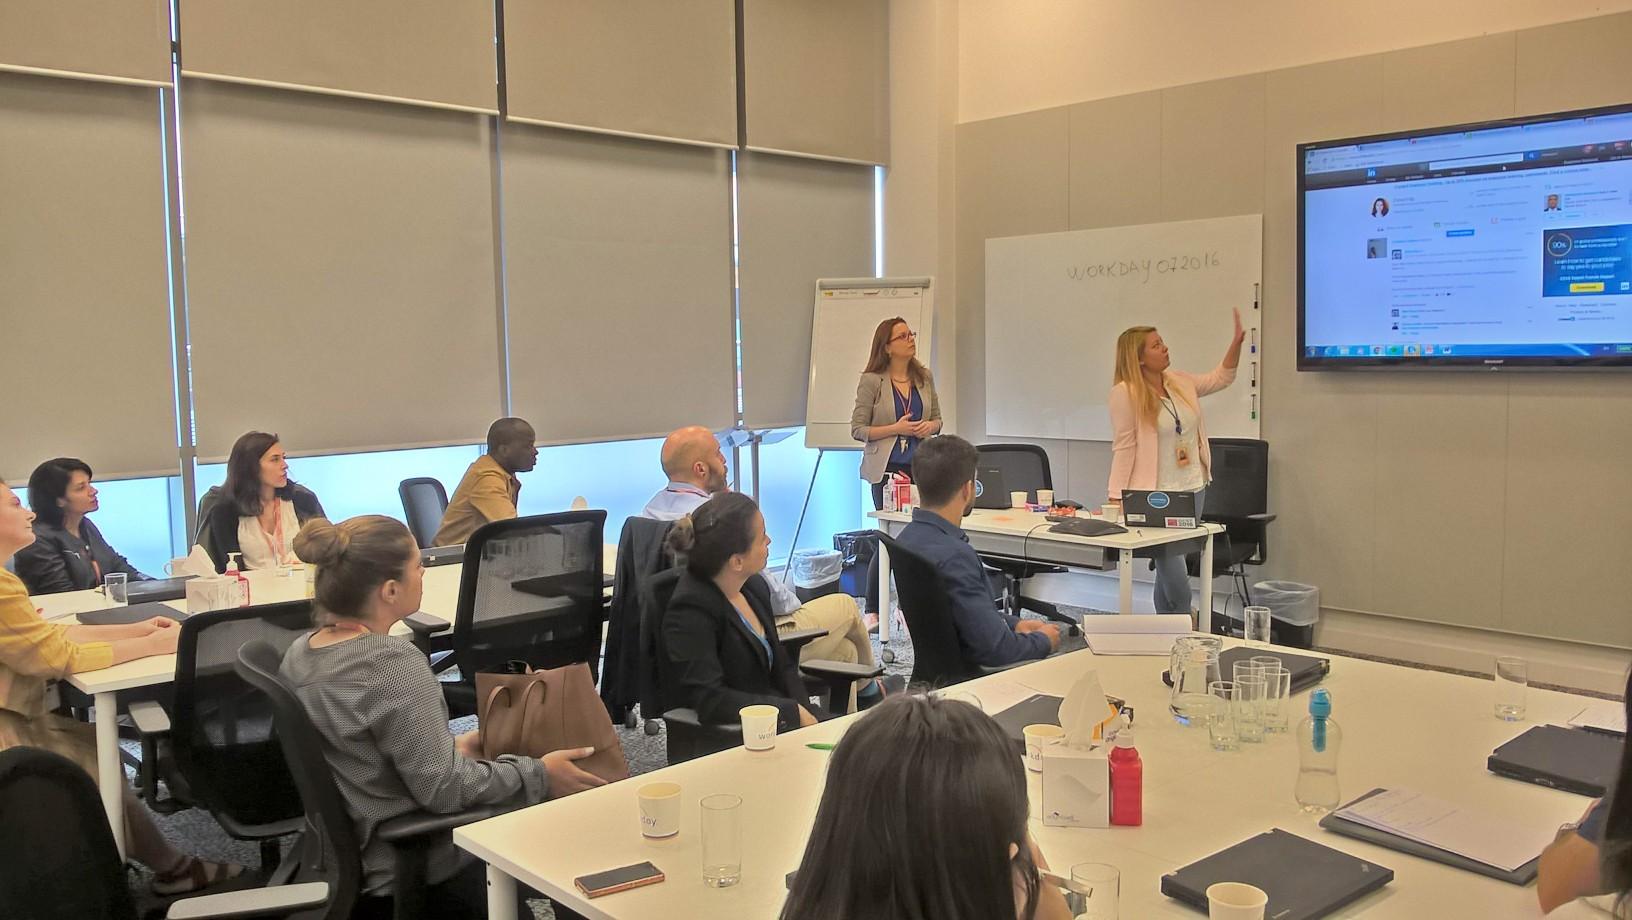 Clodagh, Elena and group learning LinkedIn 20Ju16